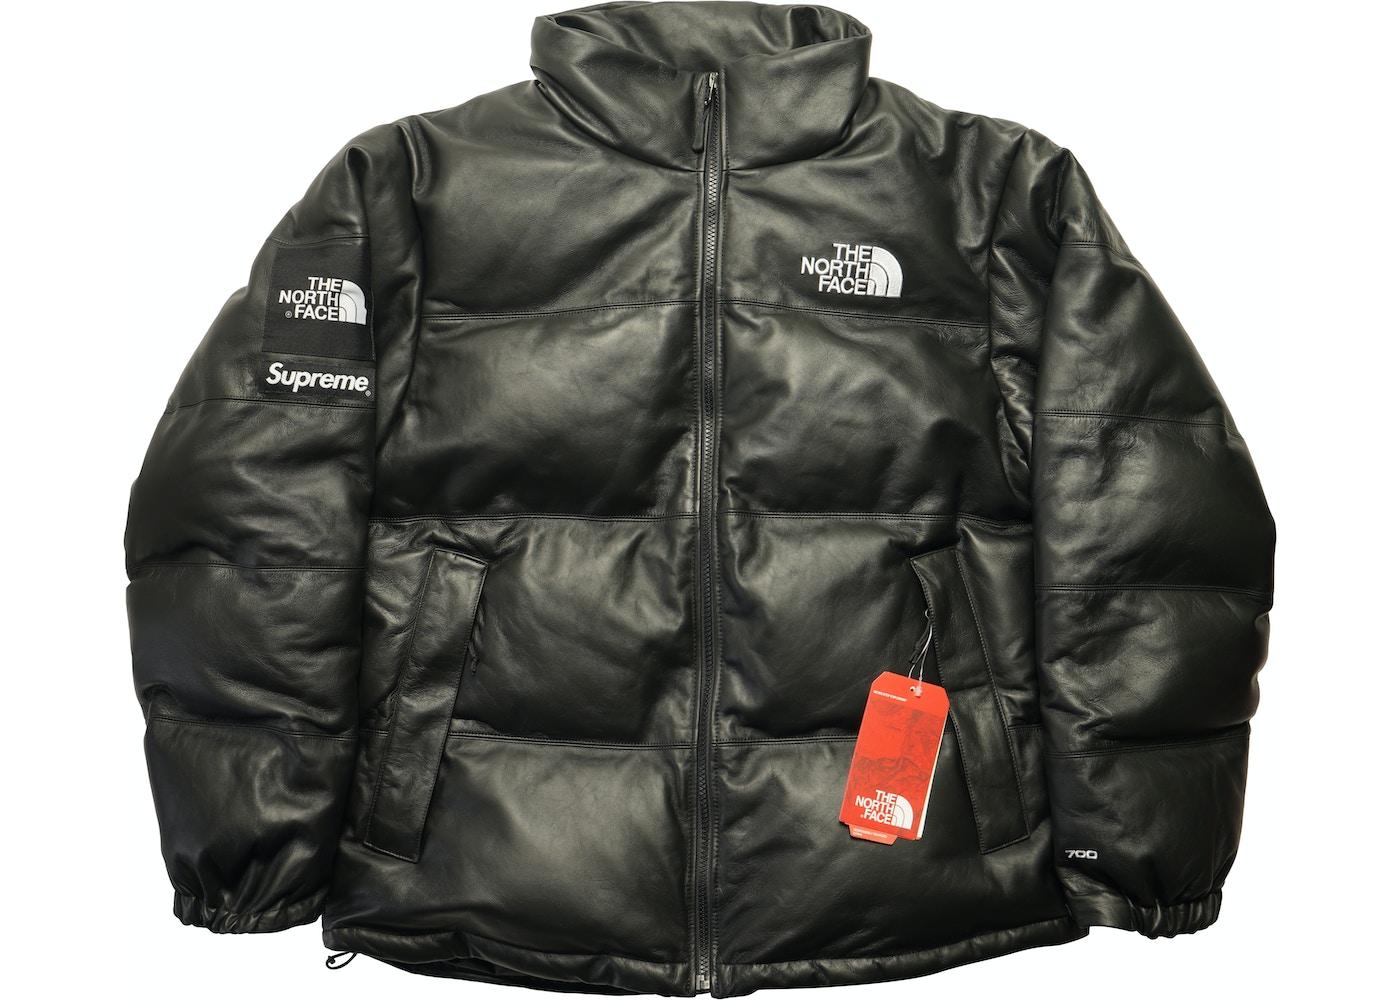 6c03a7923 Streetwear - Supreme Jackets - Average Sale Price